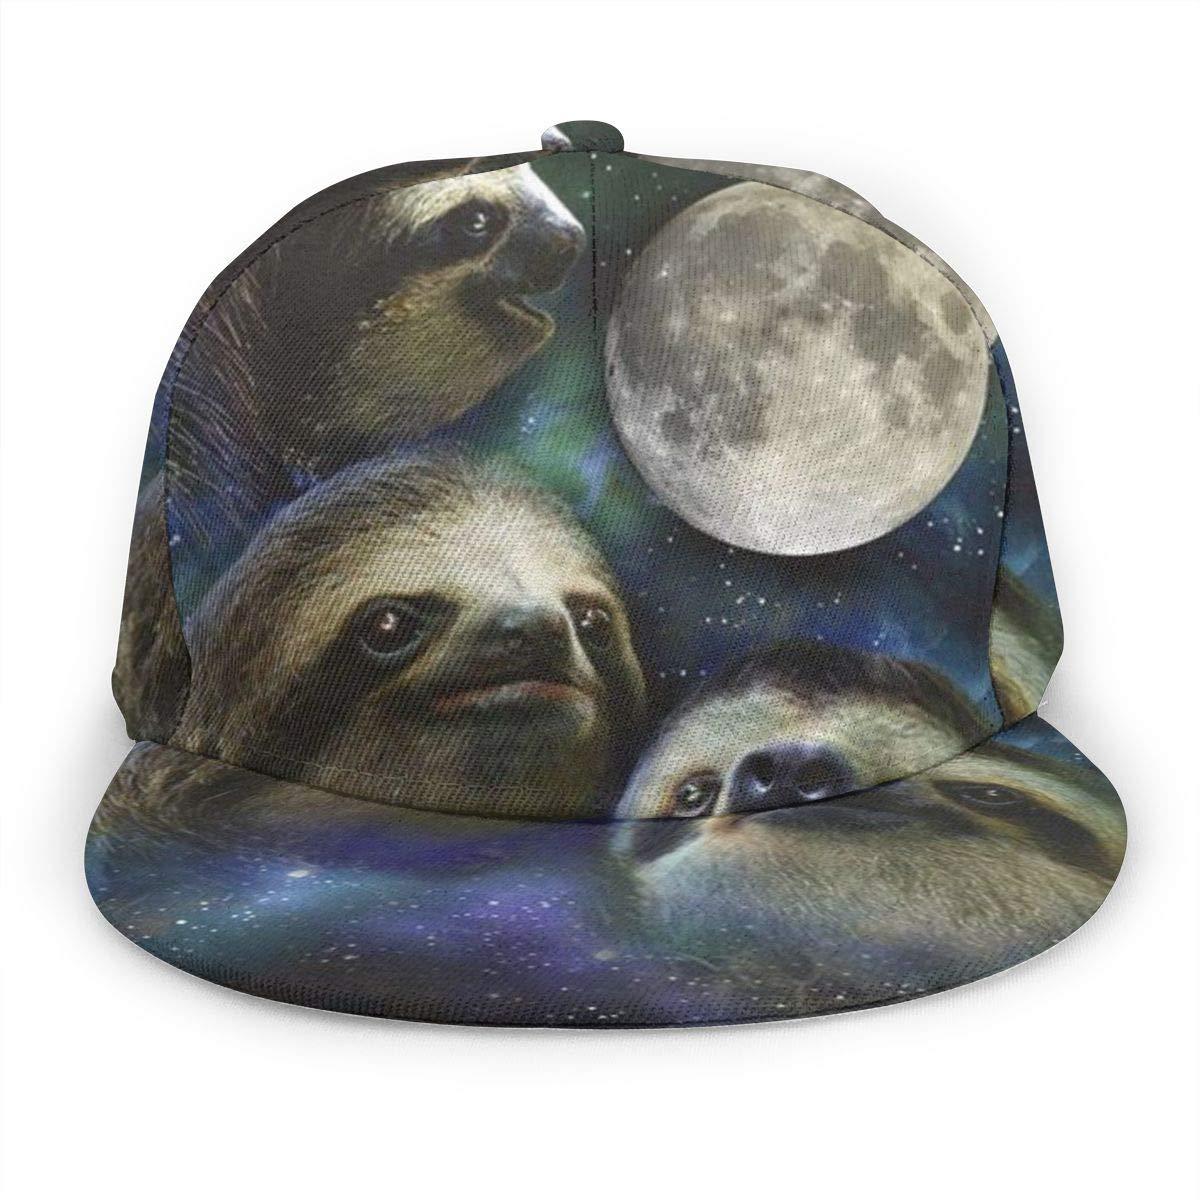 Kunming~ Three Sloth Astronauts Girl Adult Cap Adjustable Cowboys Hats Black